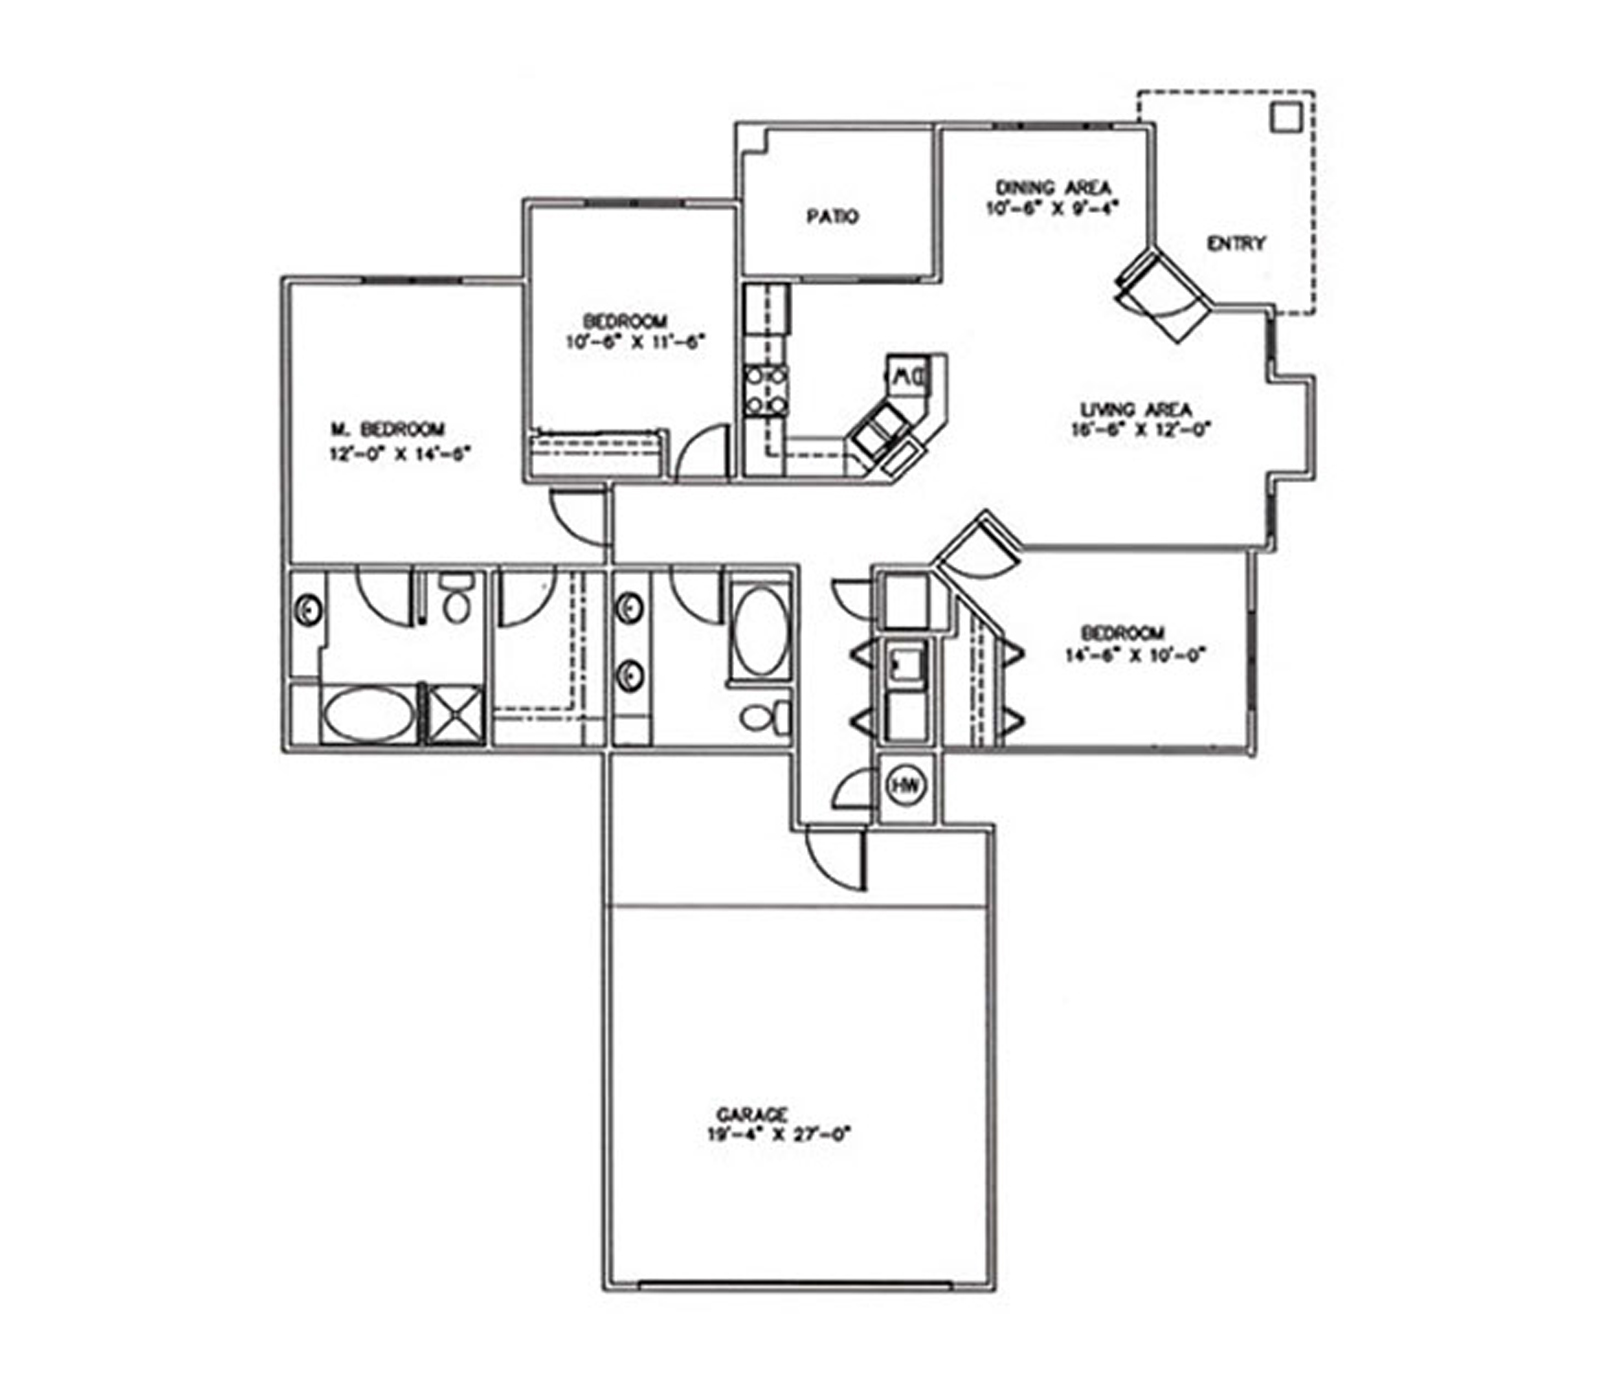 3 Bedrooms, 2 Baths, 2 Car Garage